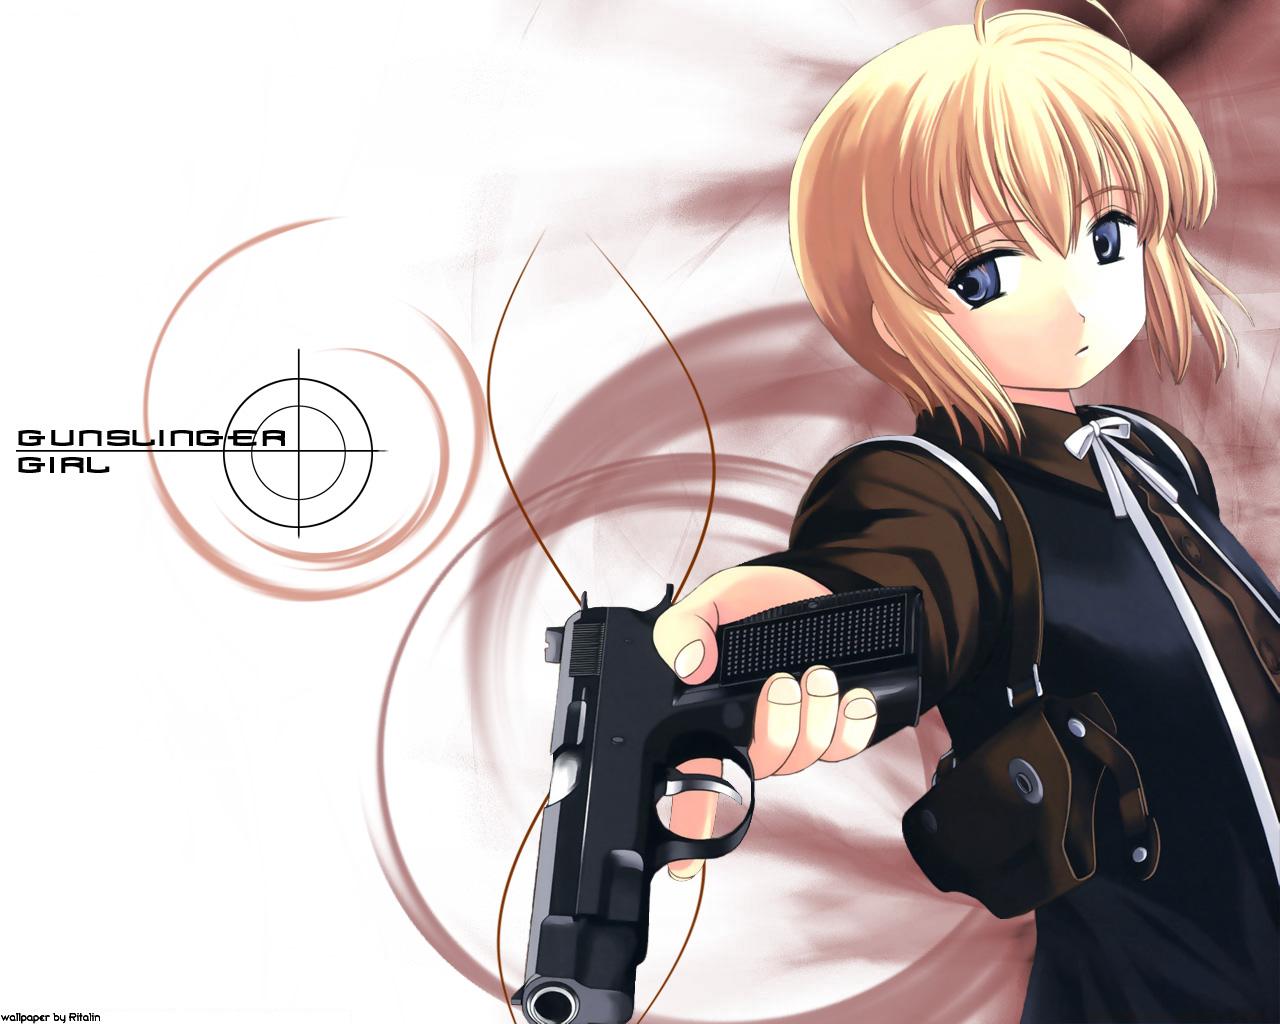 Wallpaper de rico un personaje de el anime gunslinger girl